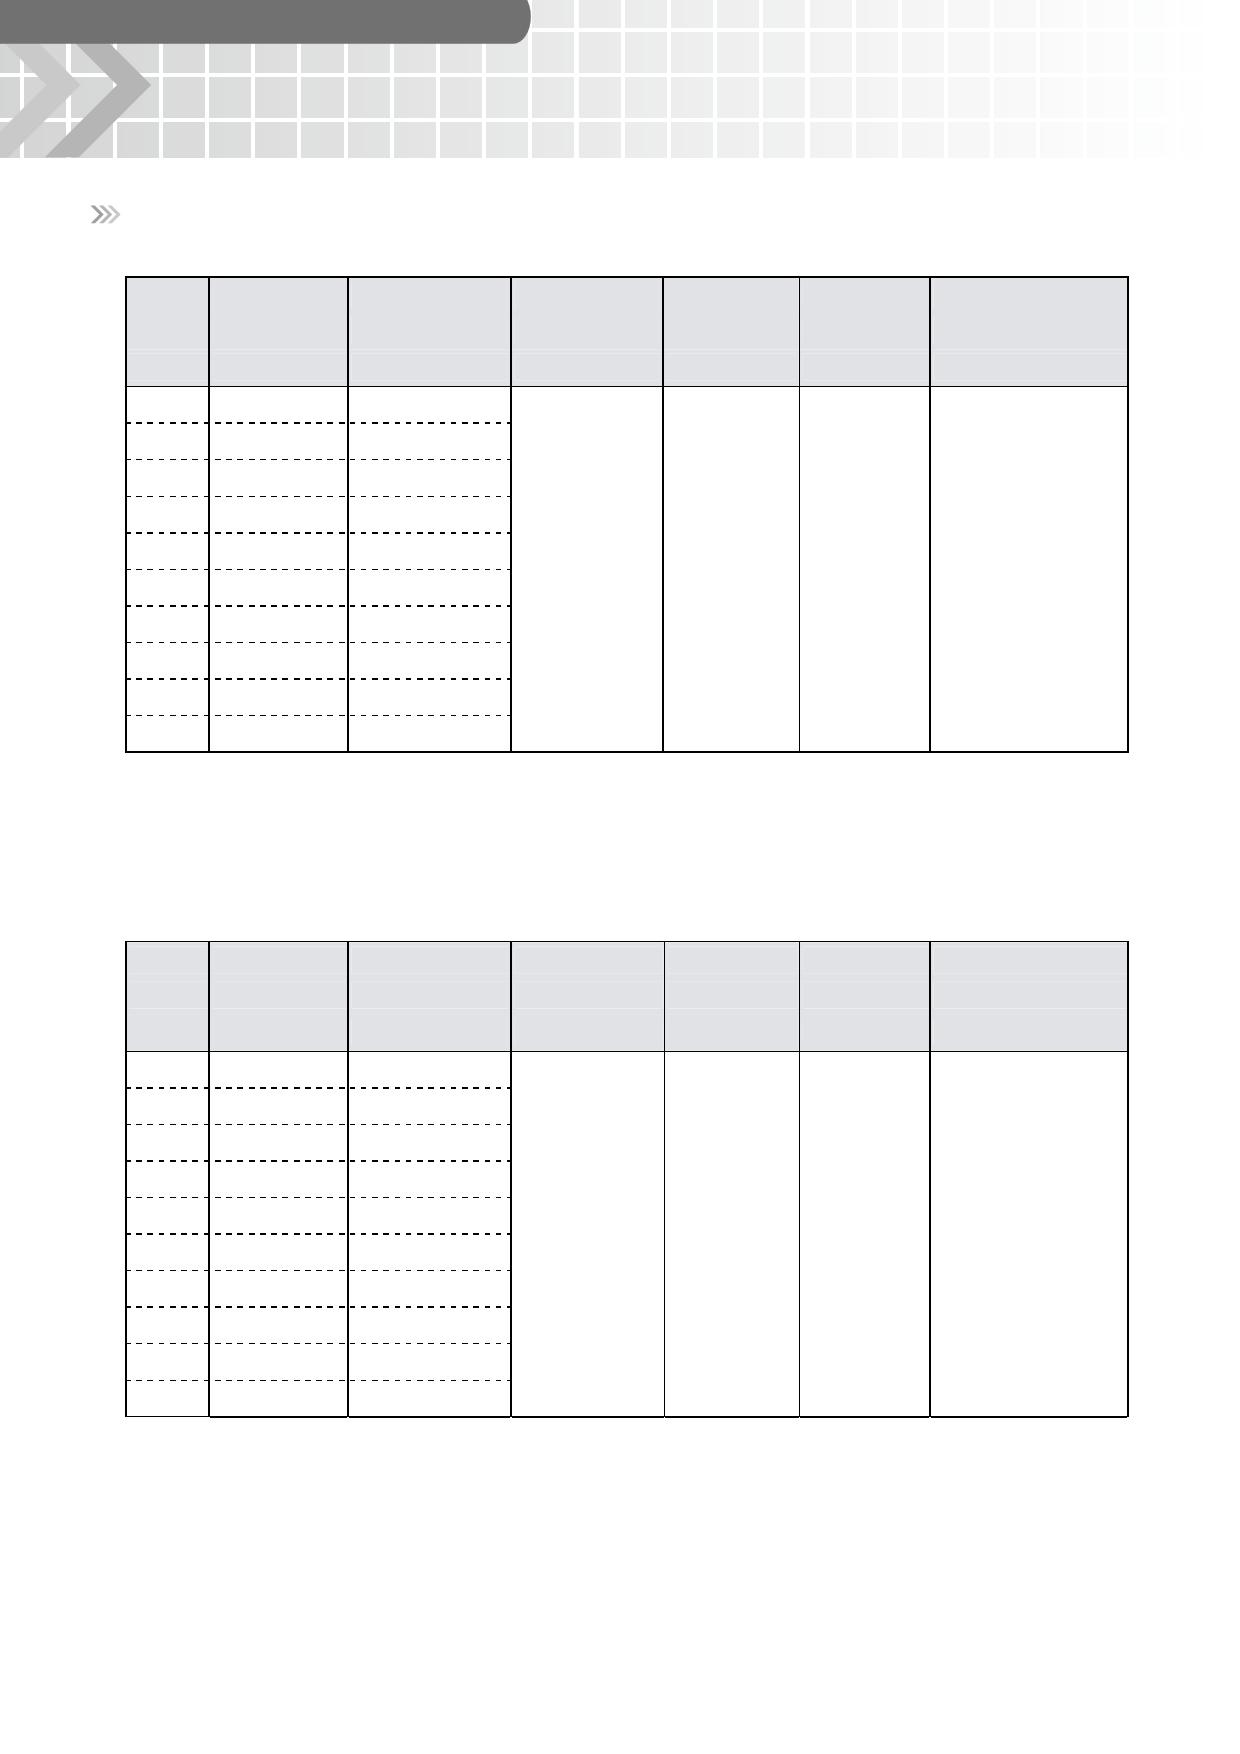 894-2ACA1-F-S pdf, ピン配列